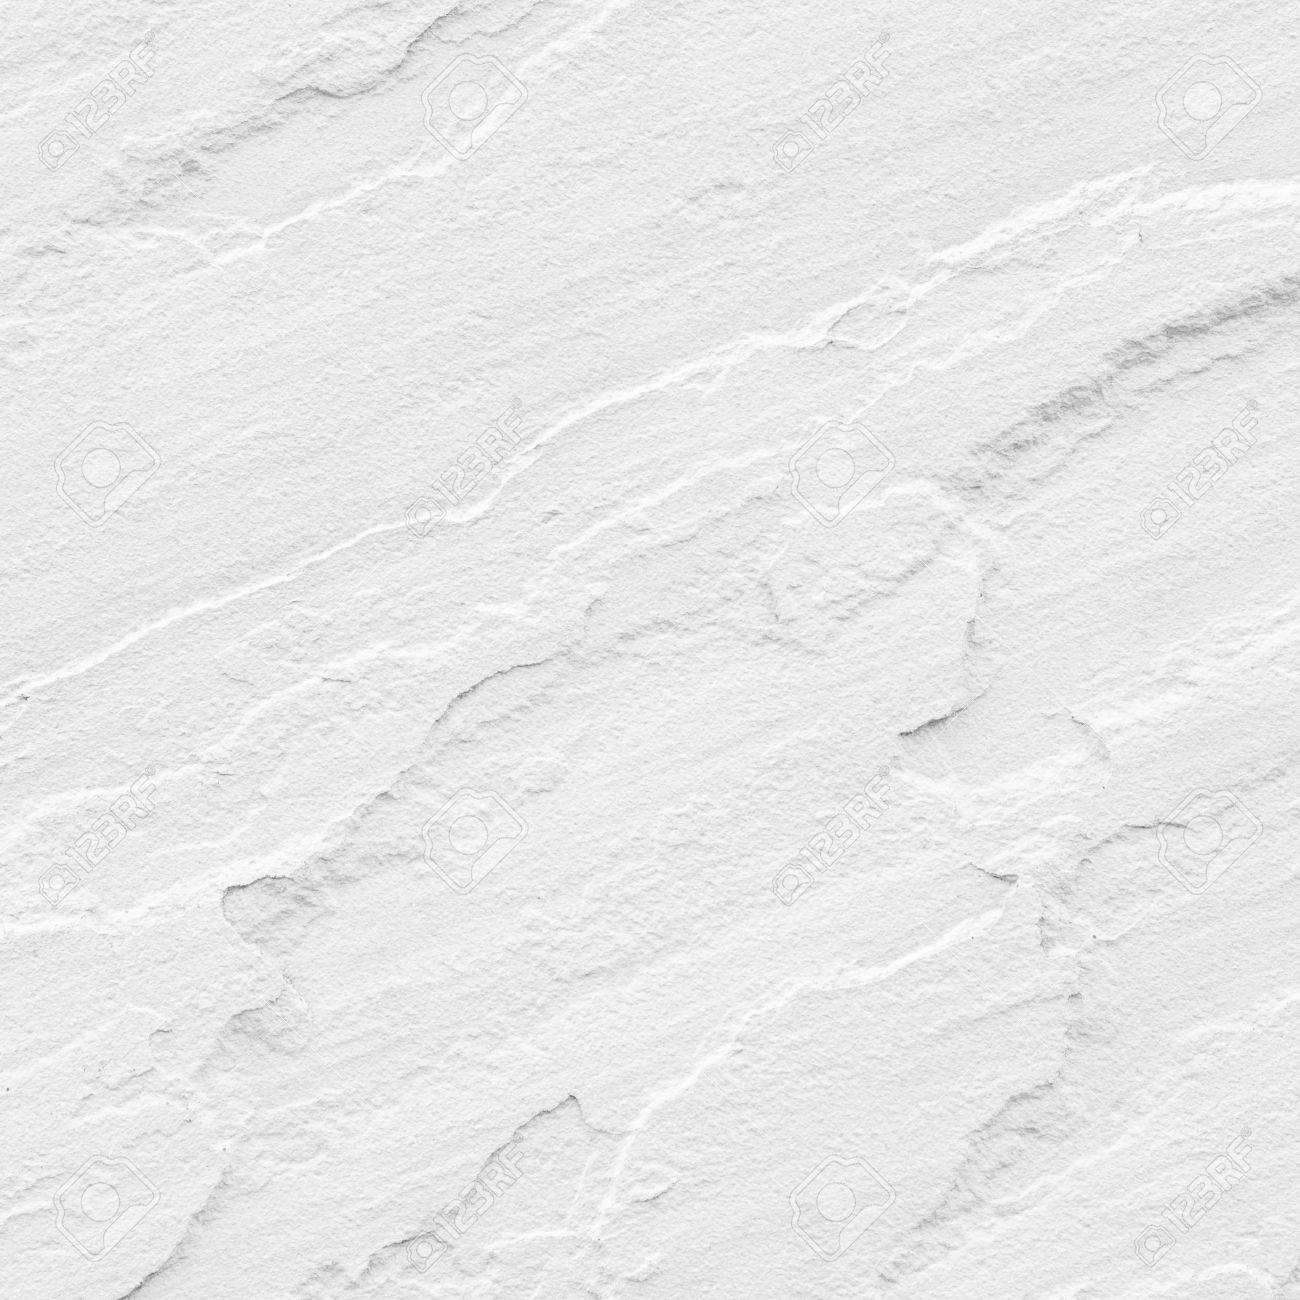 Texture And Seamless Background Of White Granite Stone Stock Photo